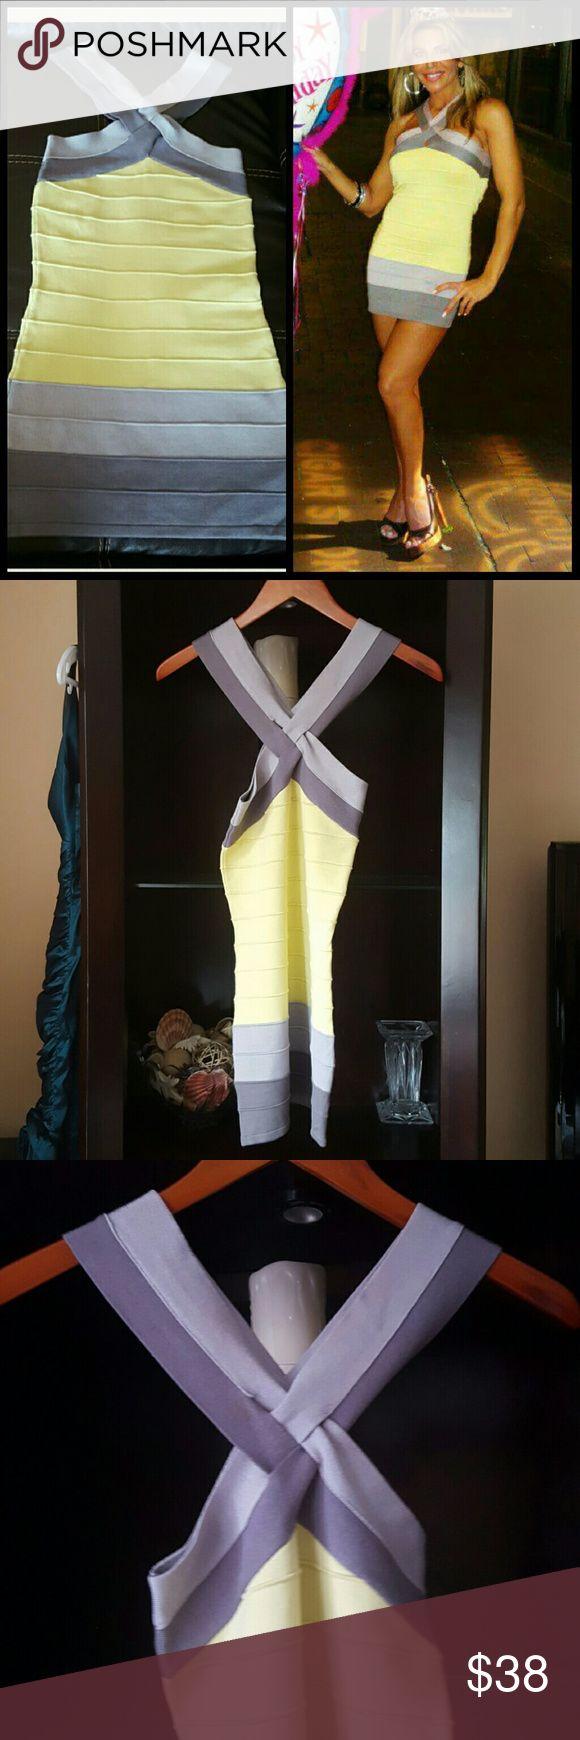 Selling this Lemon yellow/gray bandage dress SZ S in my Poshmark closet! My username is: lulouperry. #shopmycloset #poshmark #fashion #shopping #style #forsale #Hot Miami Style  #Dresses & Skirts